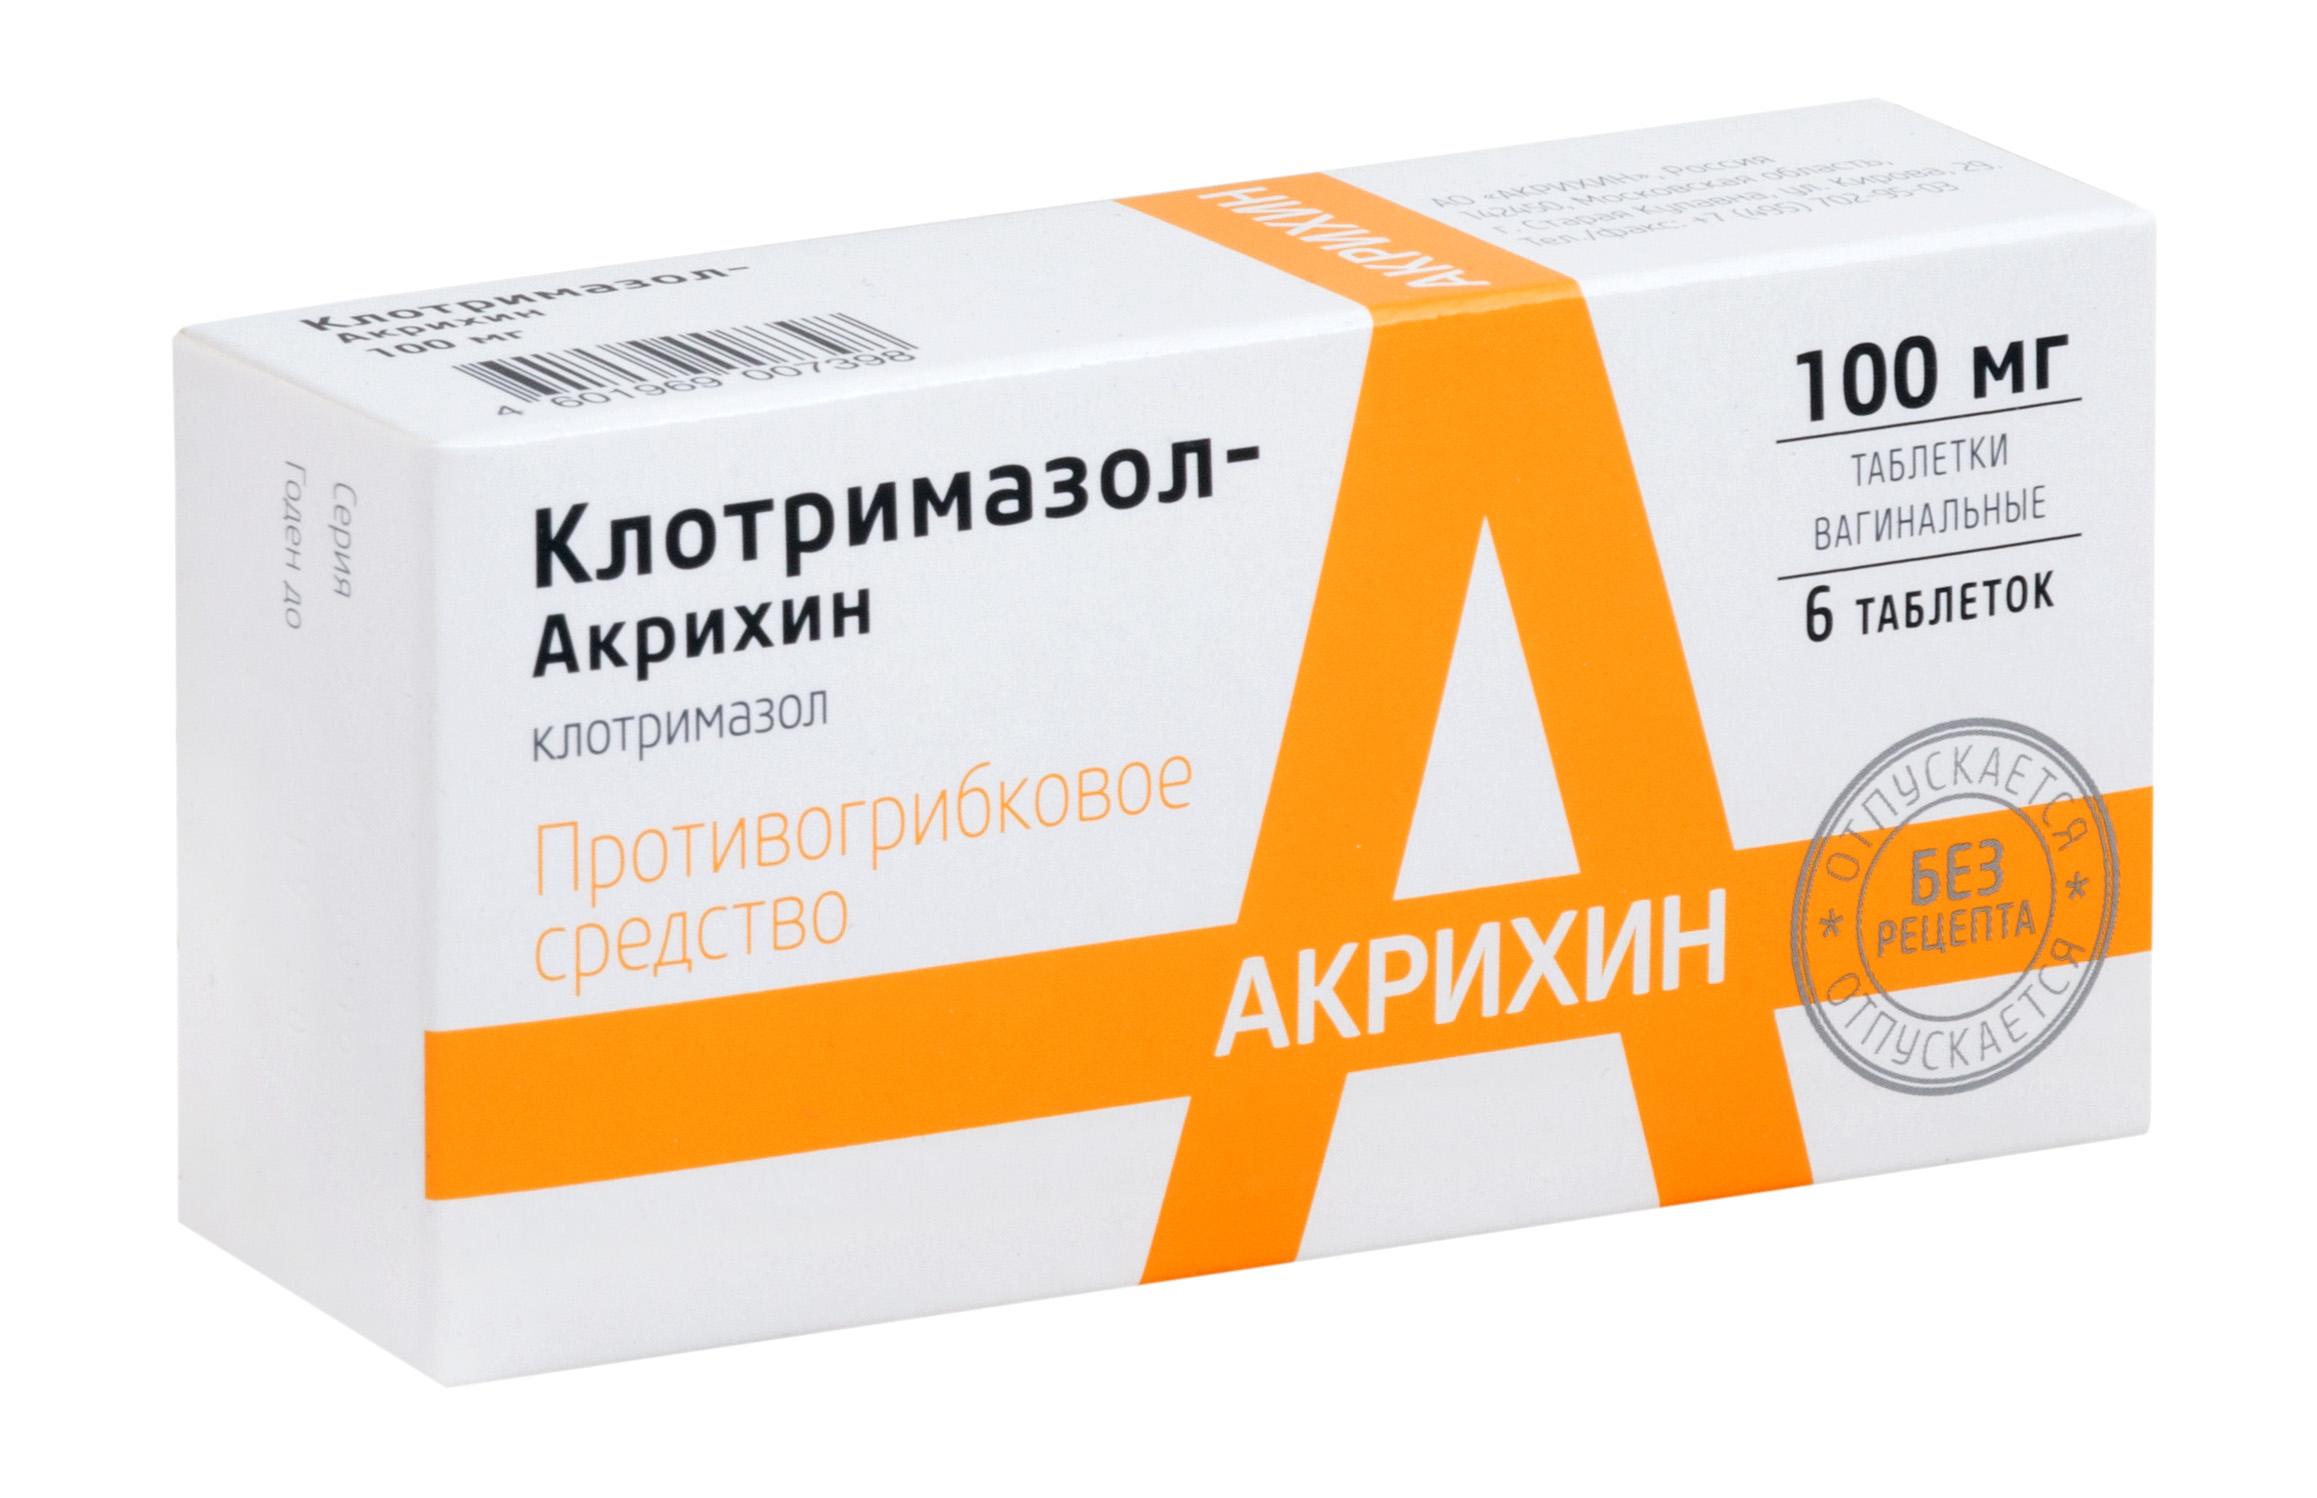 Клотримазол-акрихин таб. ваг. 100мг n6